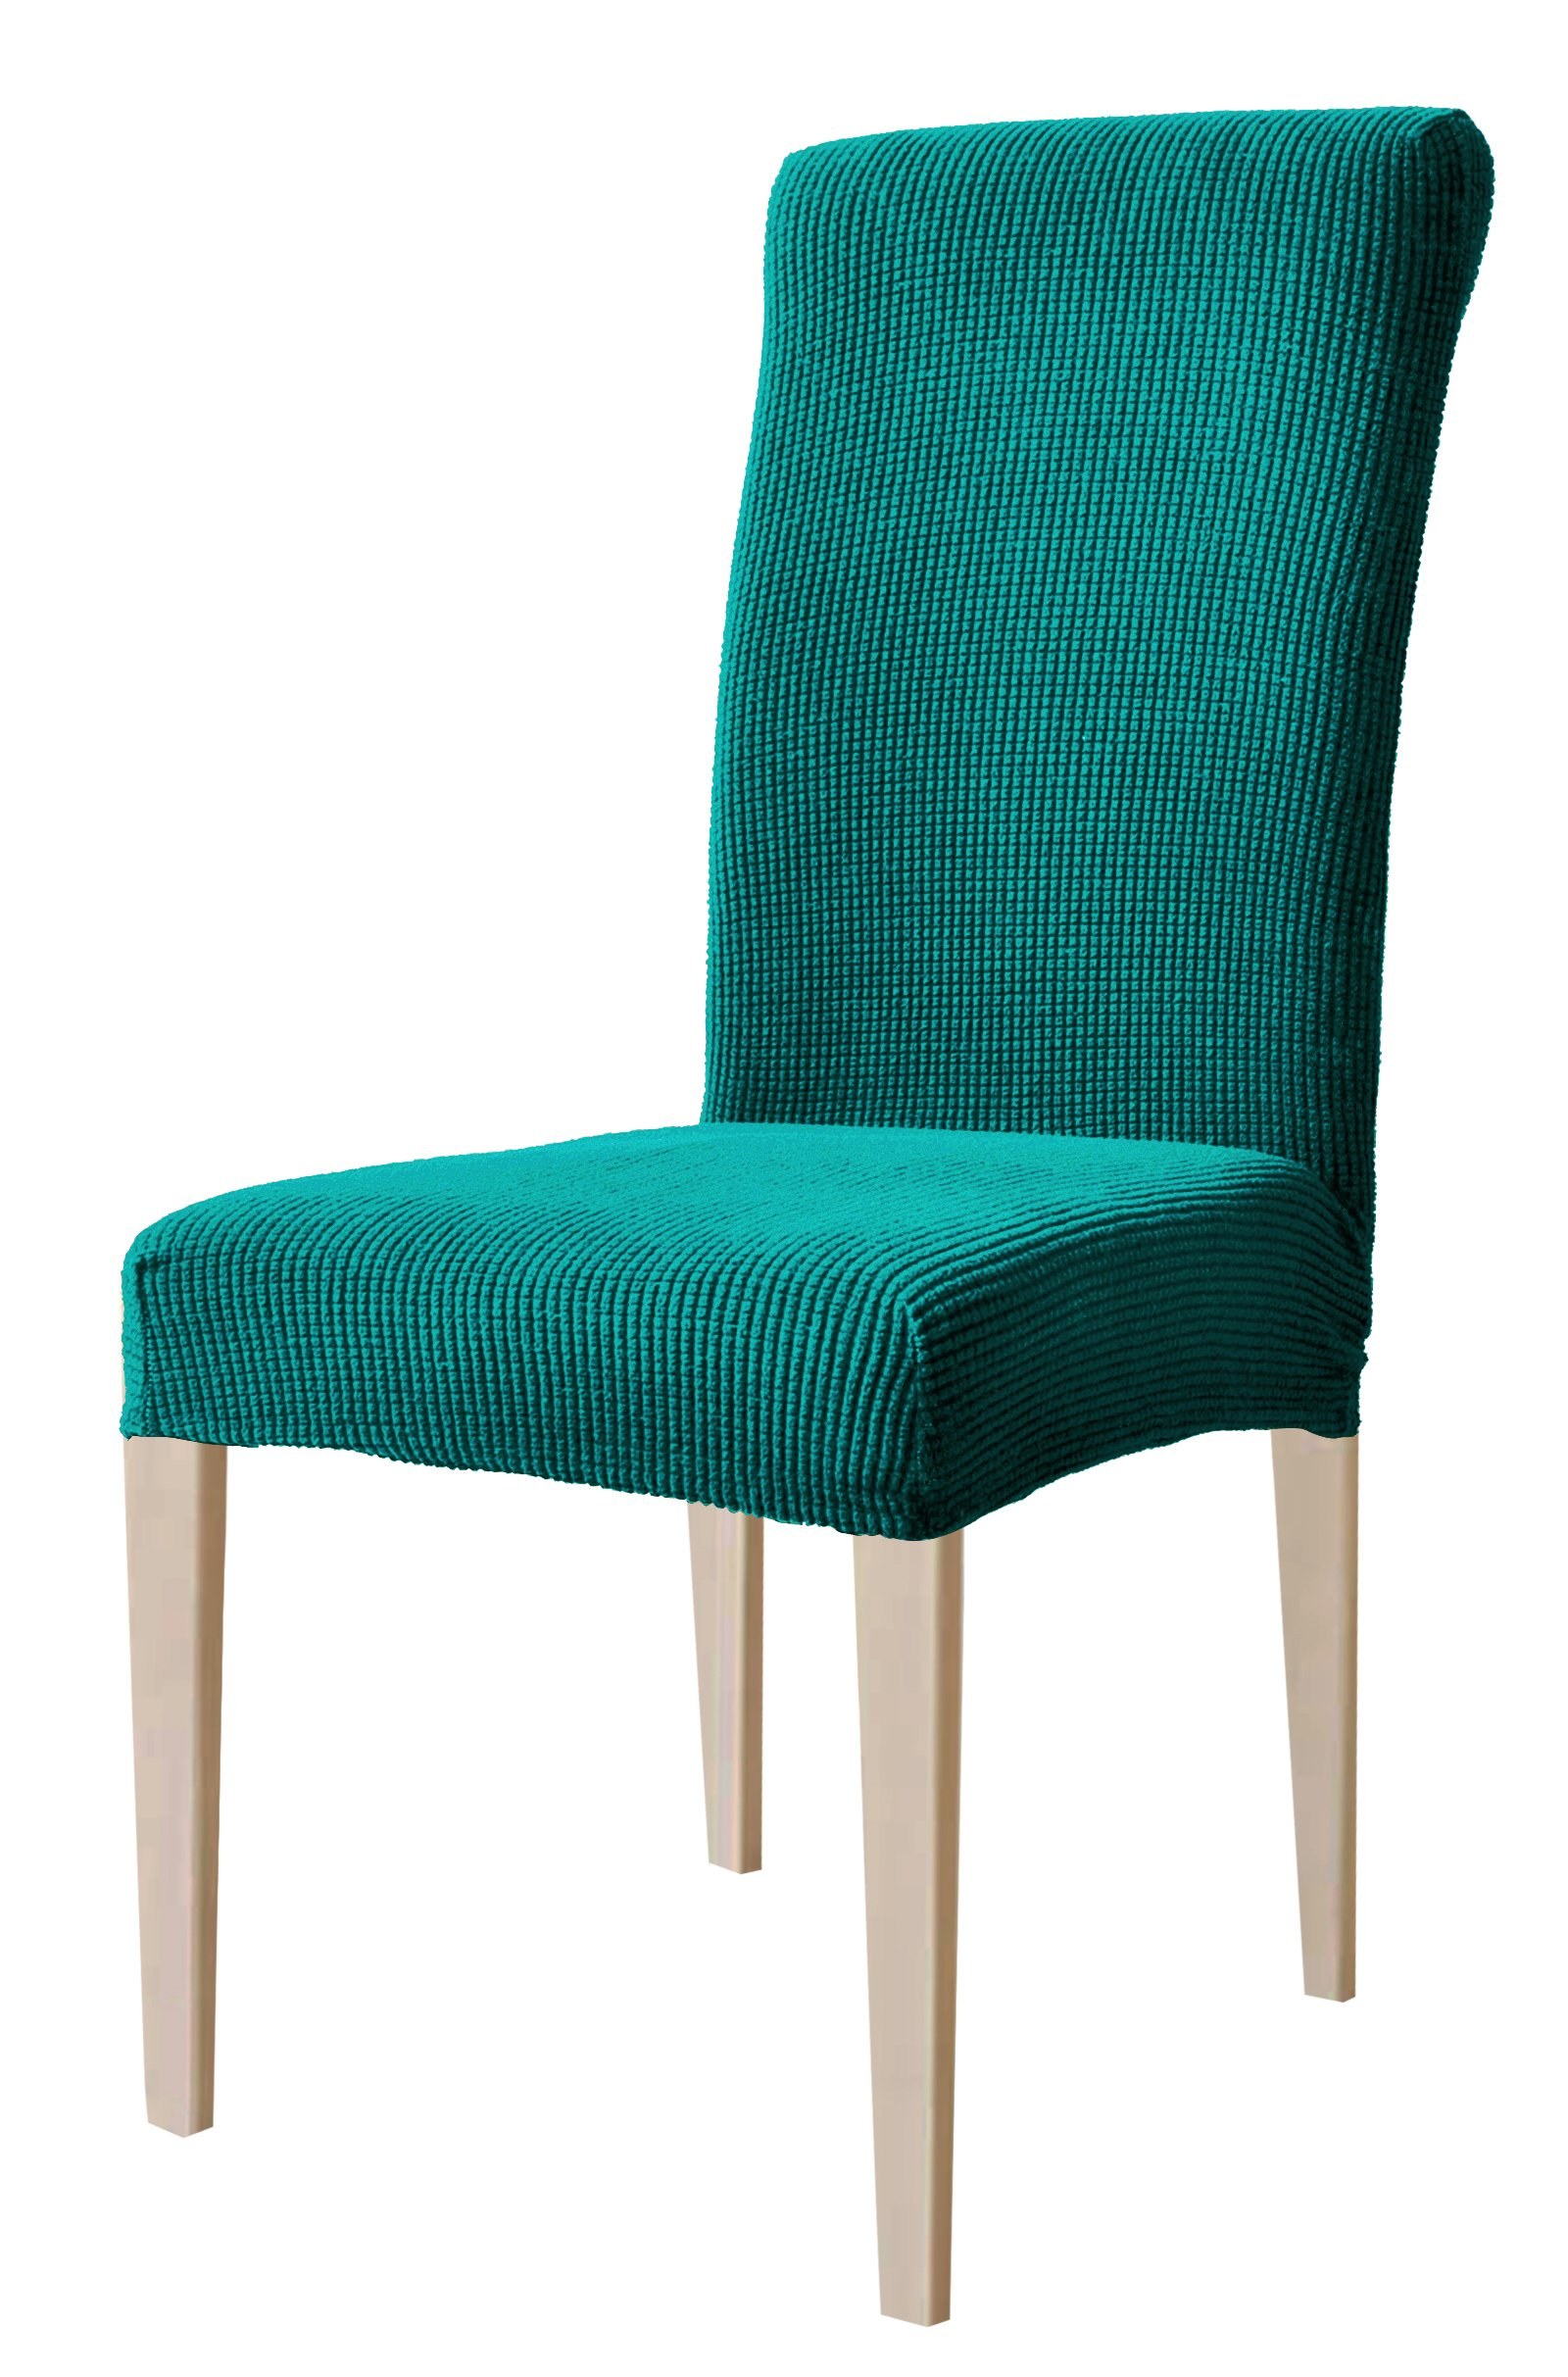 DyFun Jacquard Spandex Stretch Dining Room Chair Slipcovers (4, Blue)